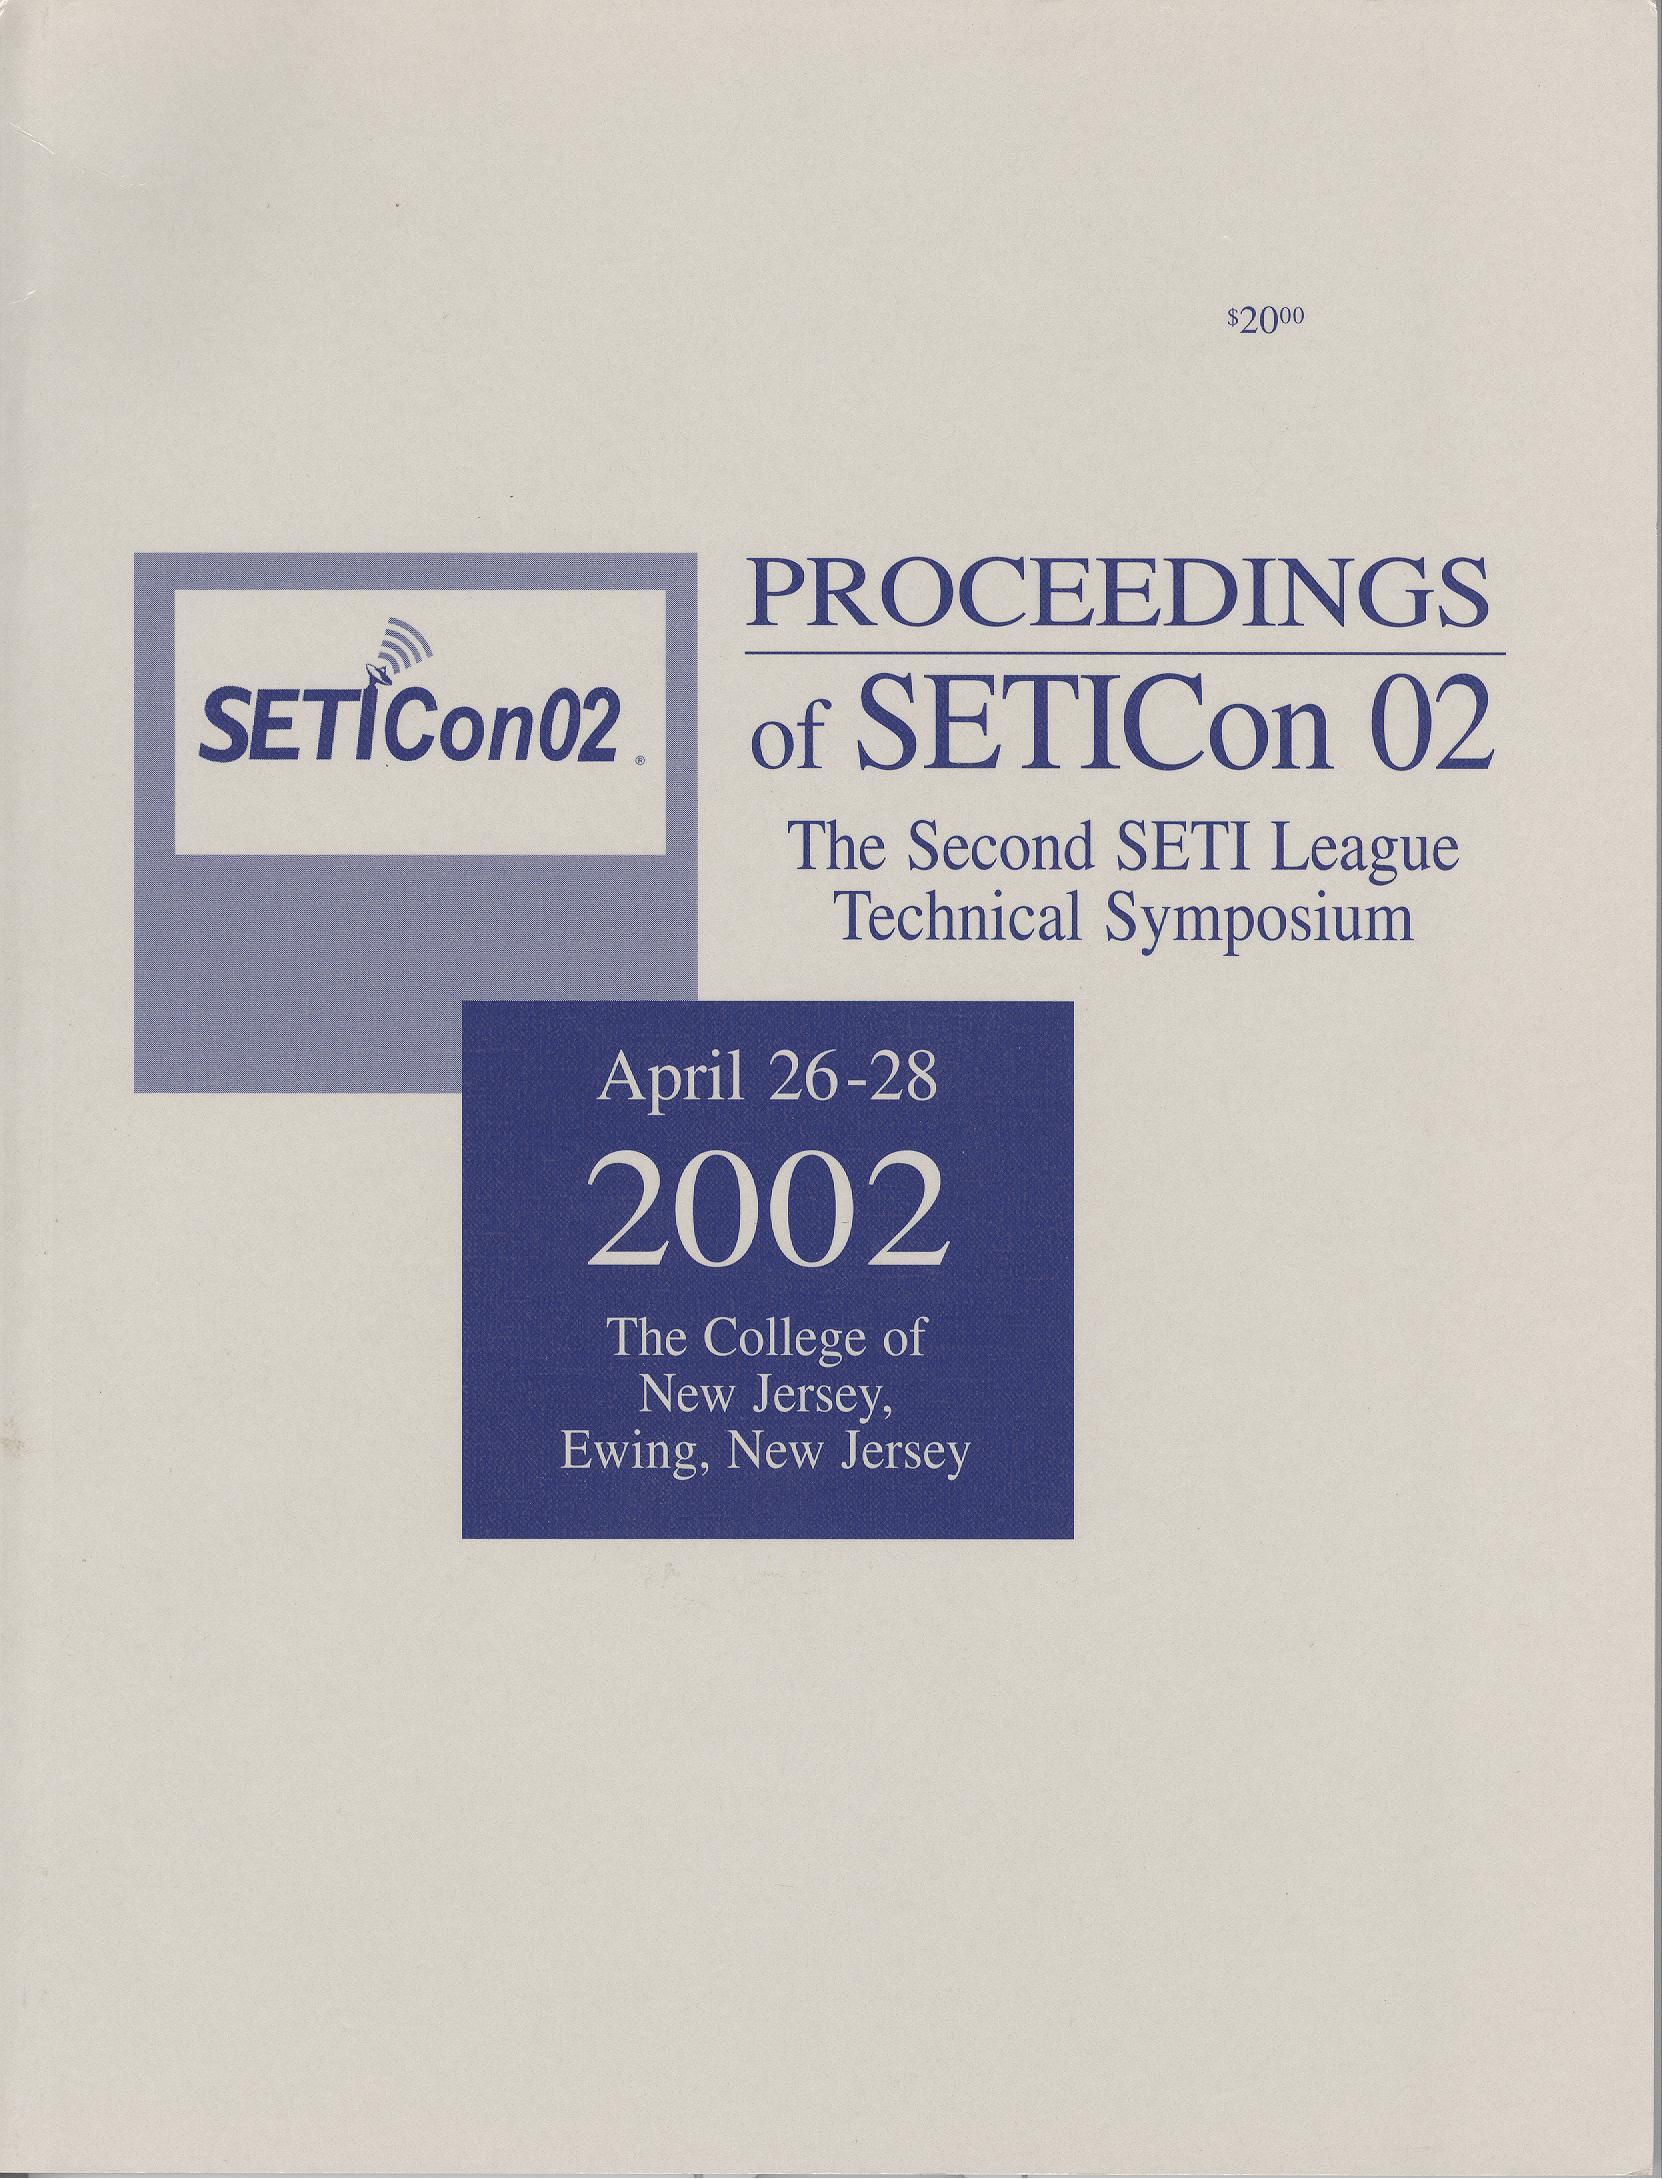 Proceedings of SETICon 02 - The Second SETI League Technical Symposium 2002